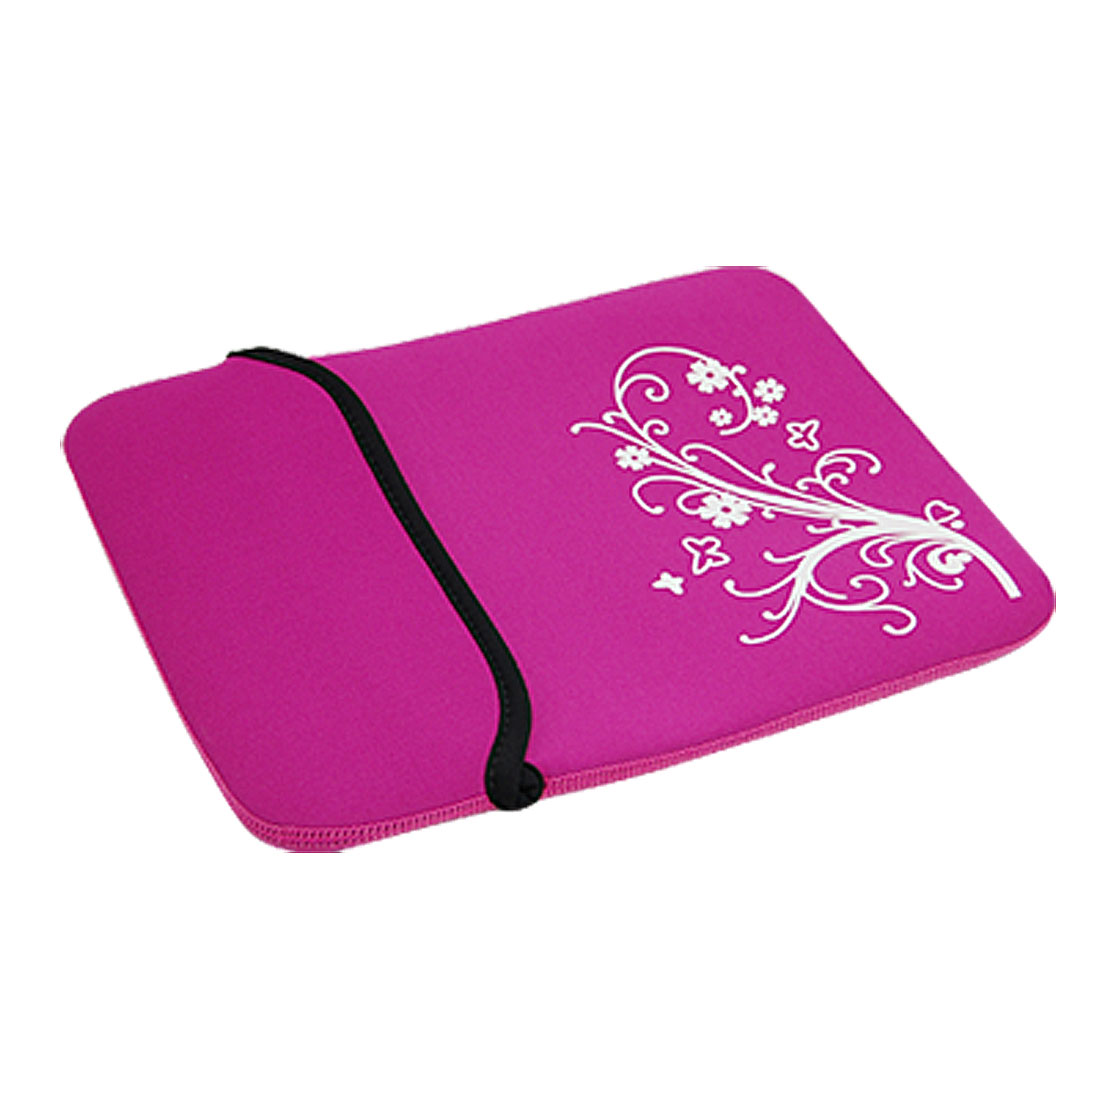 "10"" 10.1"" 10.2"" Purple Neoprene Flower Tablet PC Laptop Sleeve Bag Case for iPad"